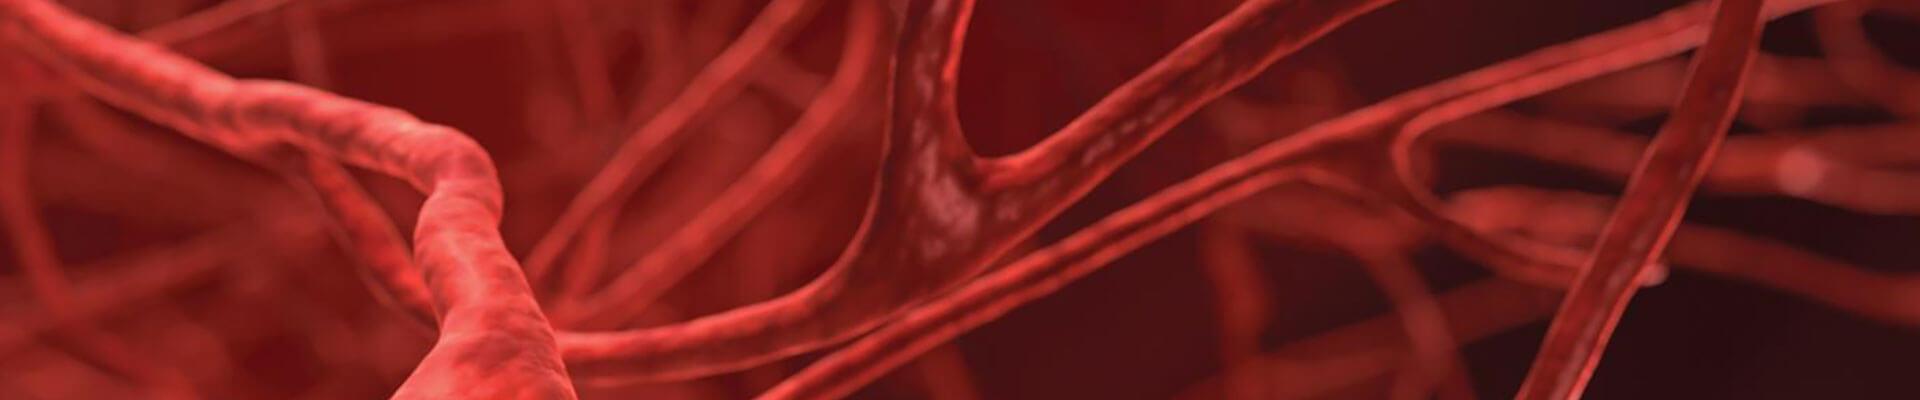 cirugia_vascular_endovascular_ivei